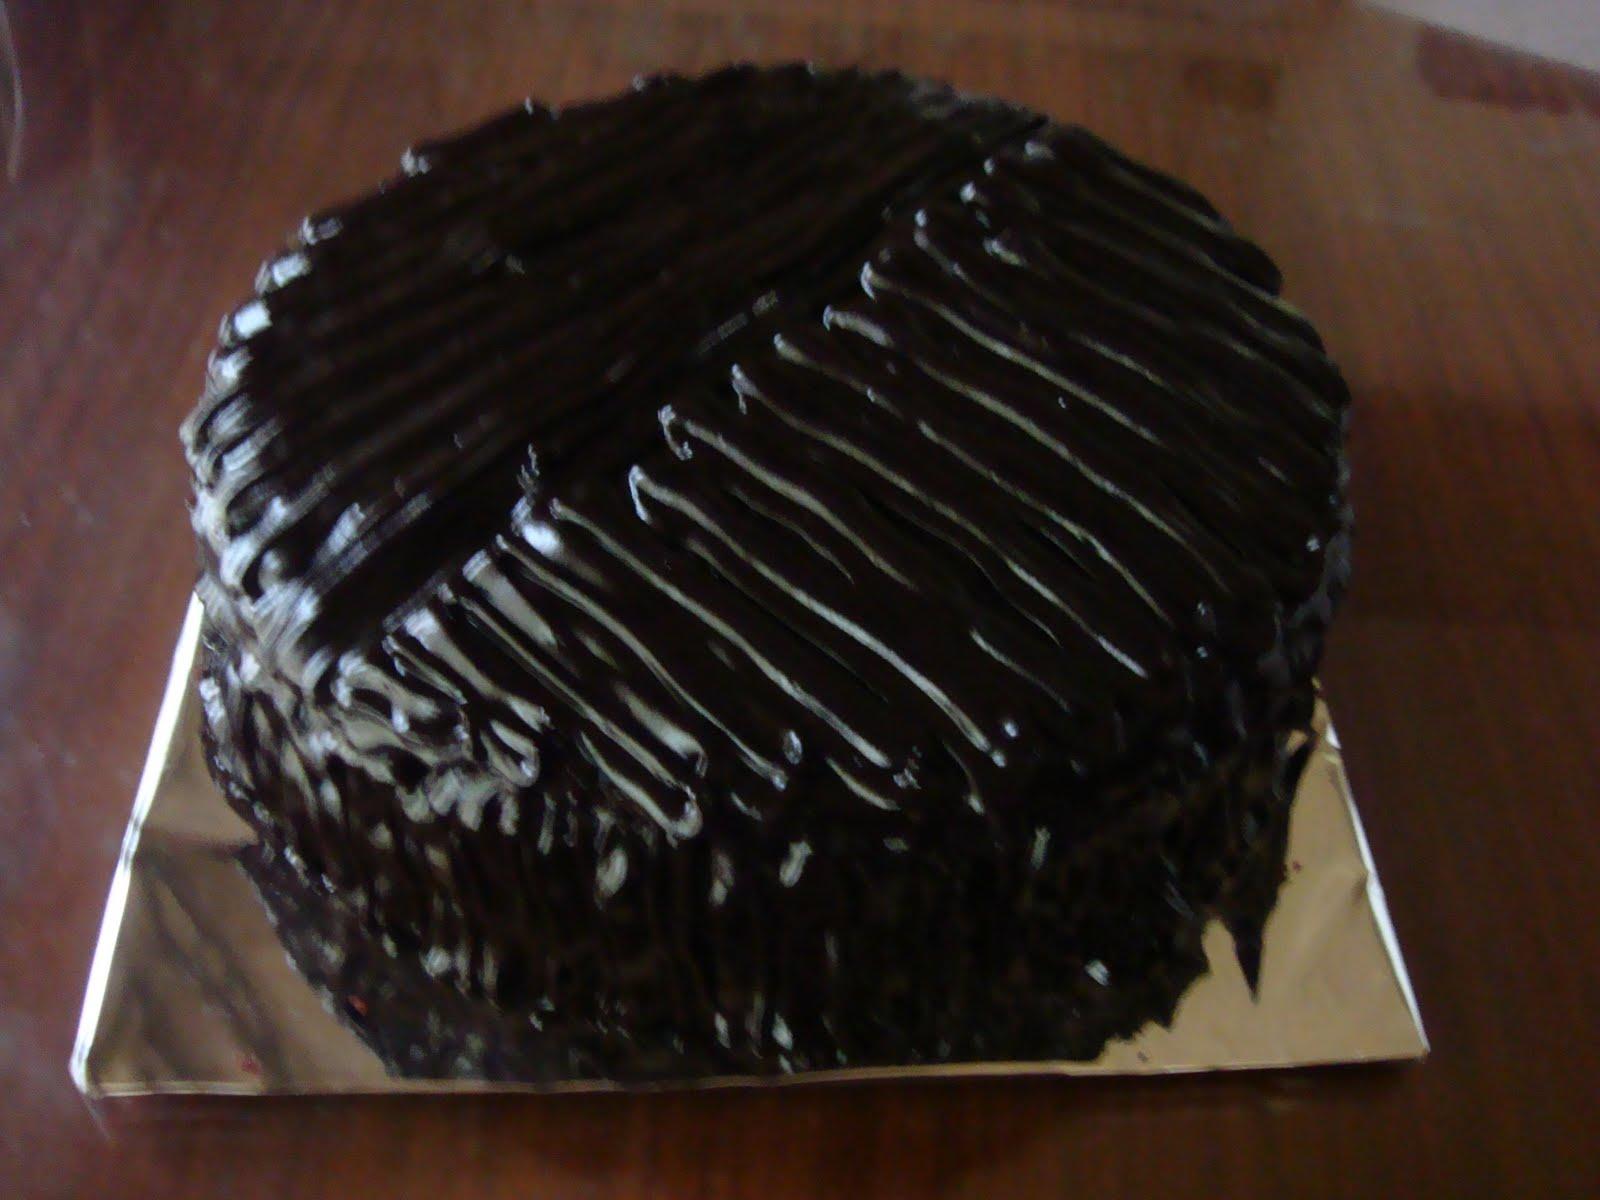 Goldilocks Chocolate Cake Images : yencakes: Moist Chocolate Cake with Coffee Caramel Filling